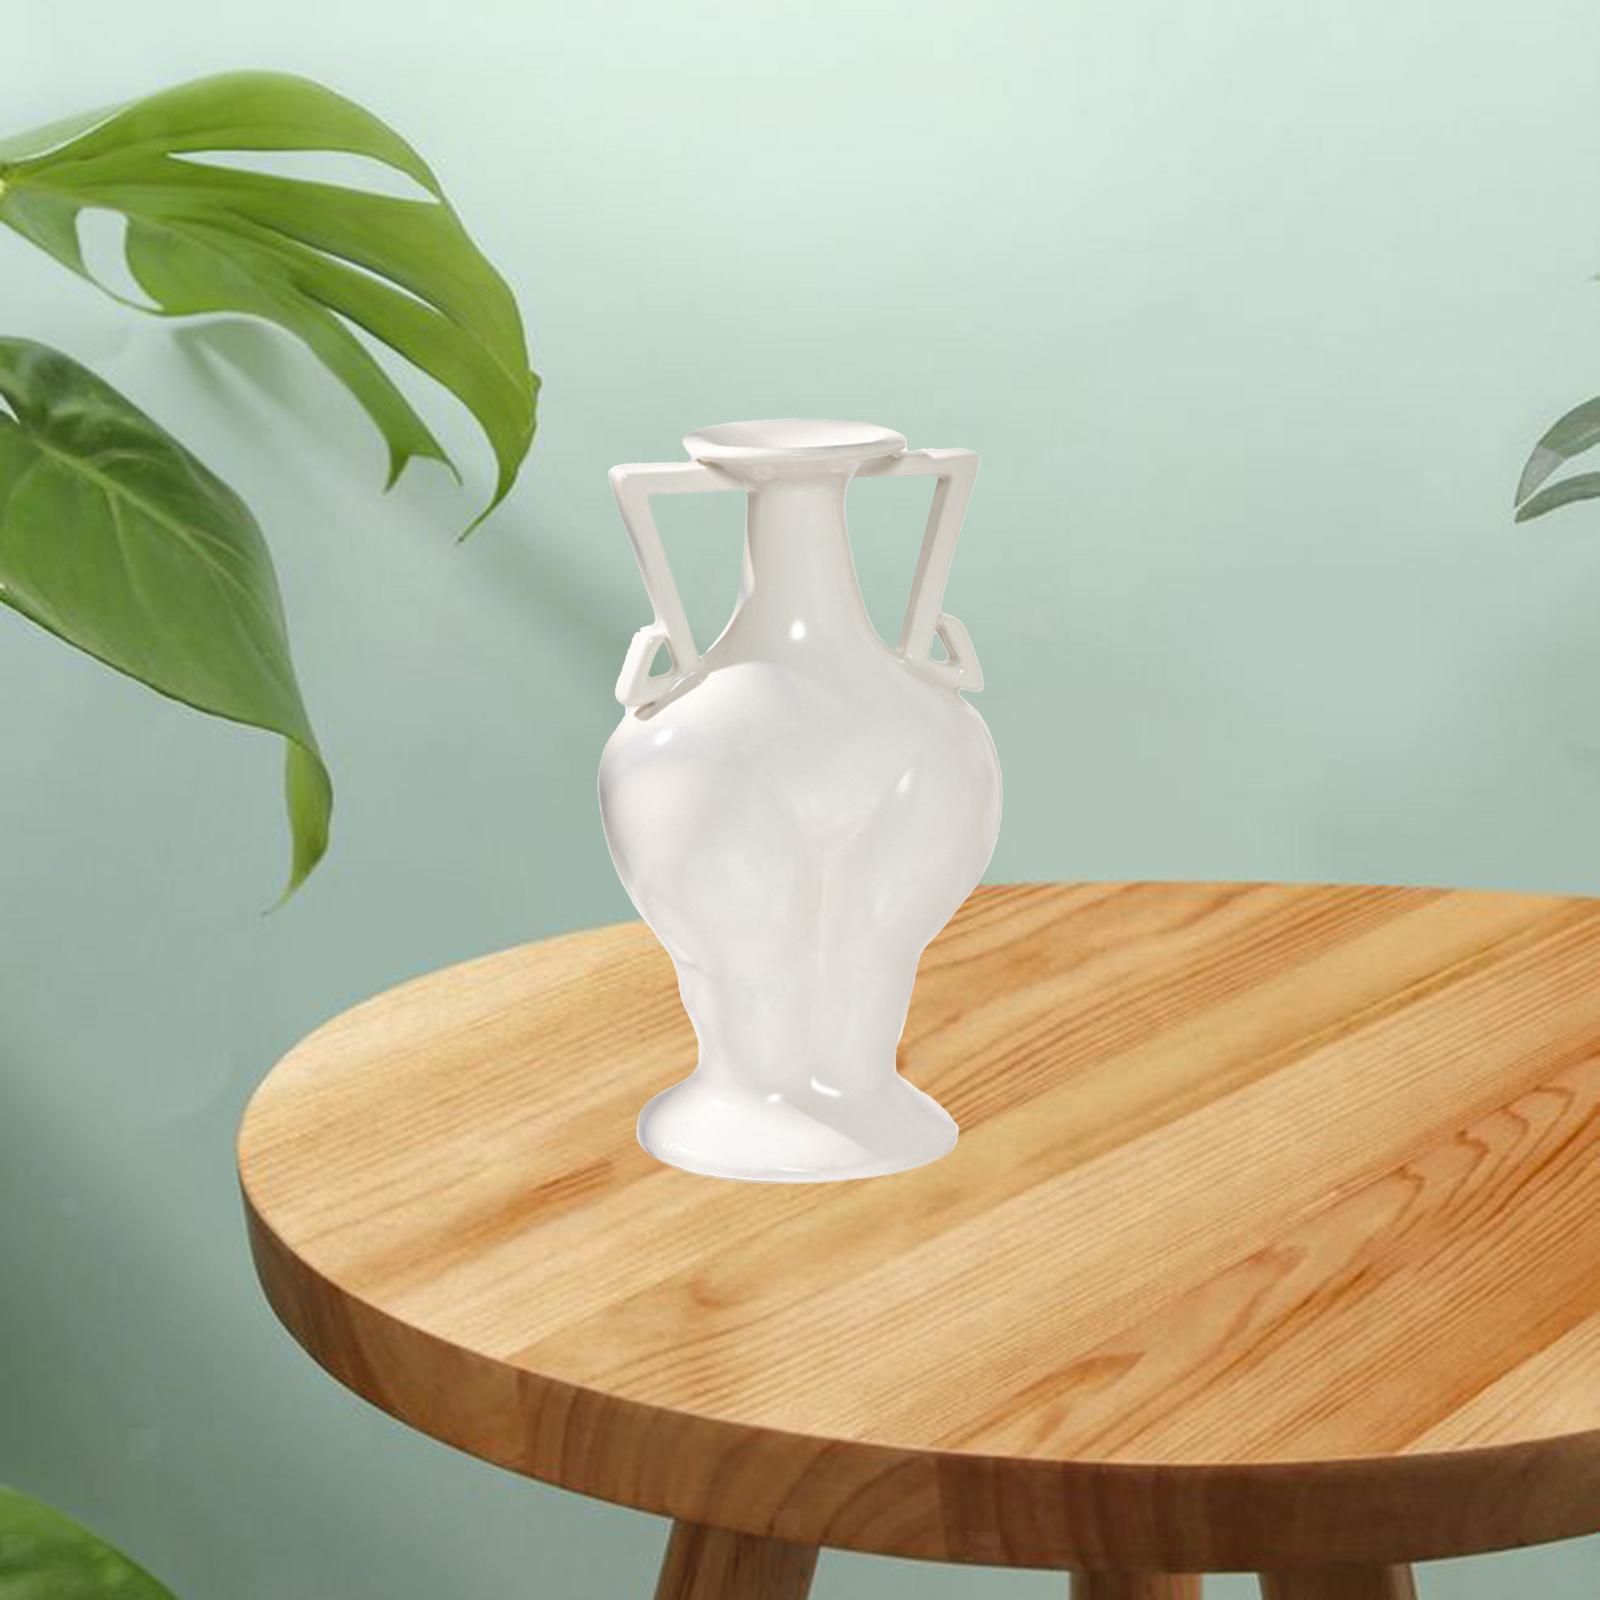 Indexbild 31 - Blumenvase Keramik Blumentöpfe Trockenblumenhalter Pflanzenvasen Wohnkultur